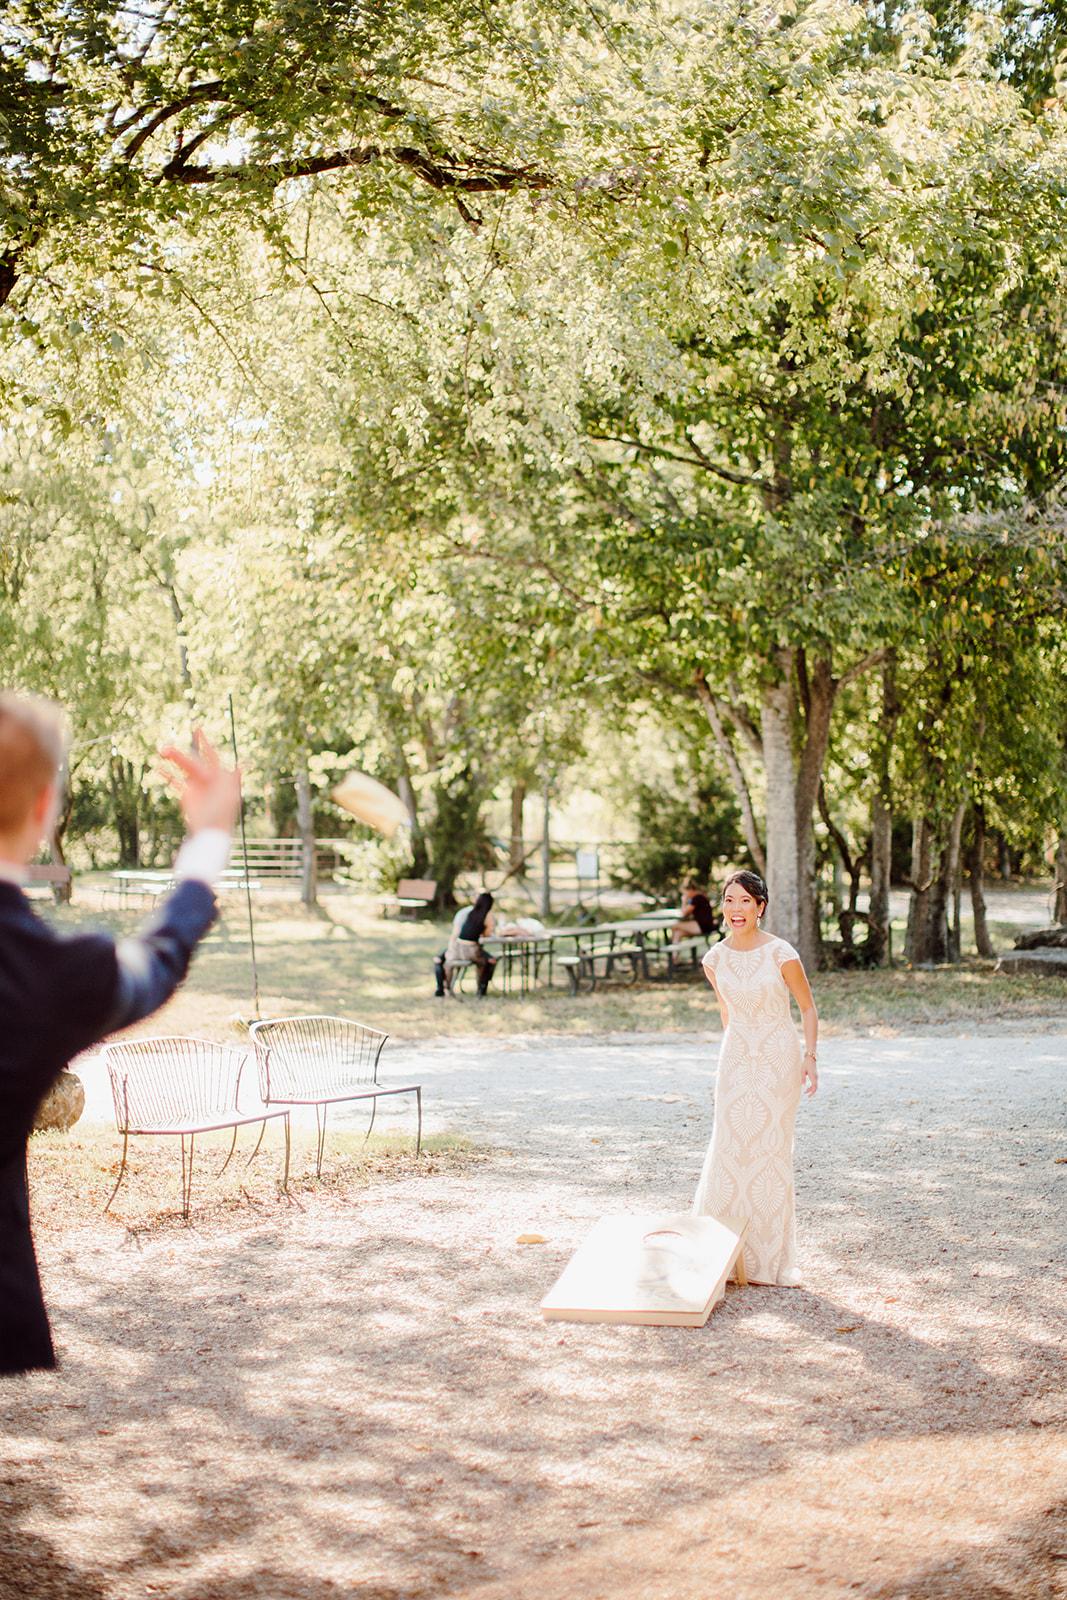 Bride and groom playing cornhole